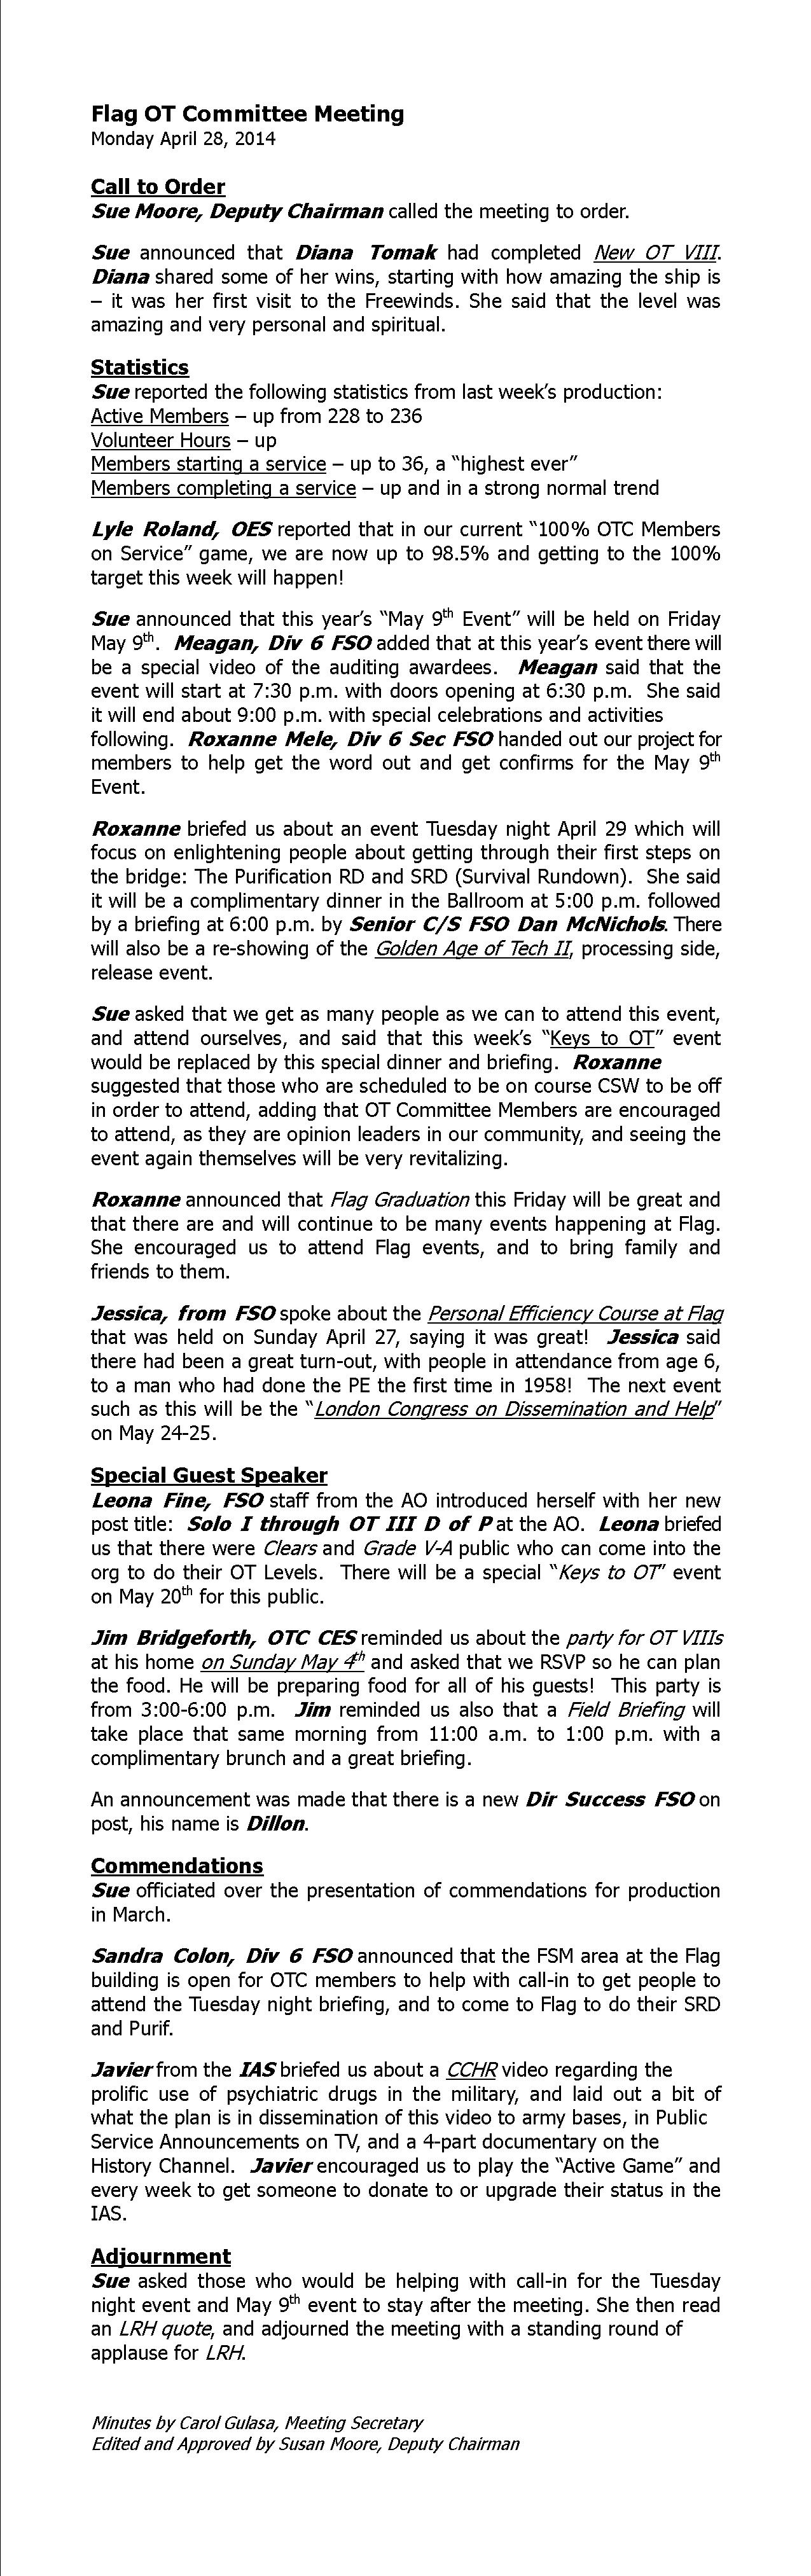 Flag-OTC-Minutes-28apr14.jpg